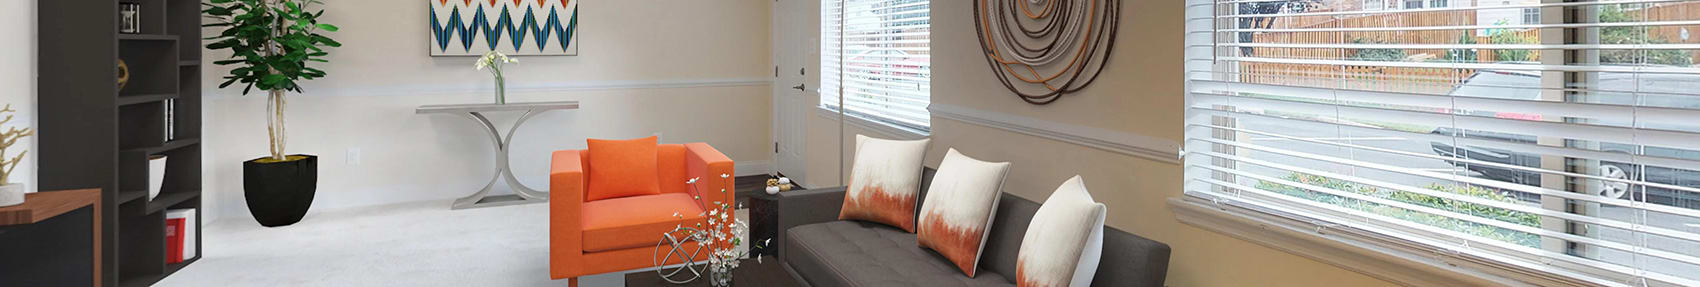 banner image panoramic of interior unit view  at Gainsborough Court Apartments, Virginia, 22030